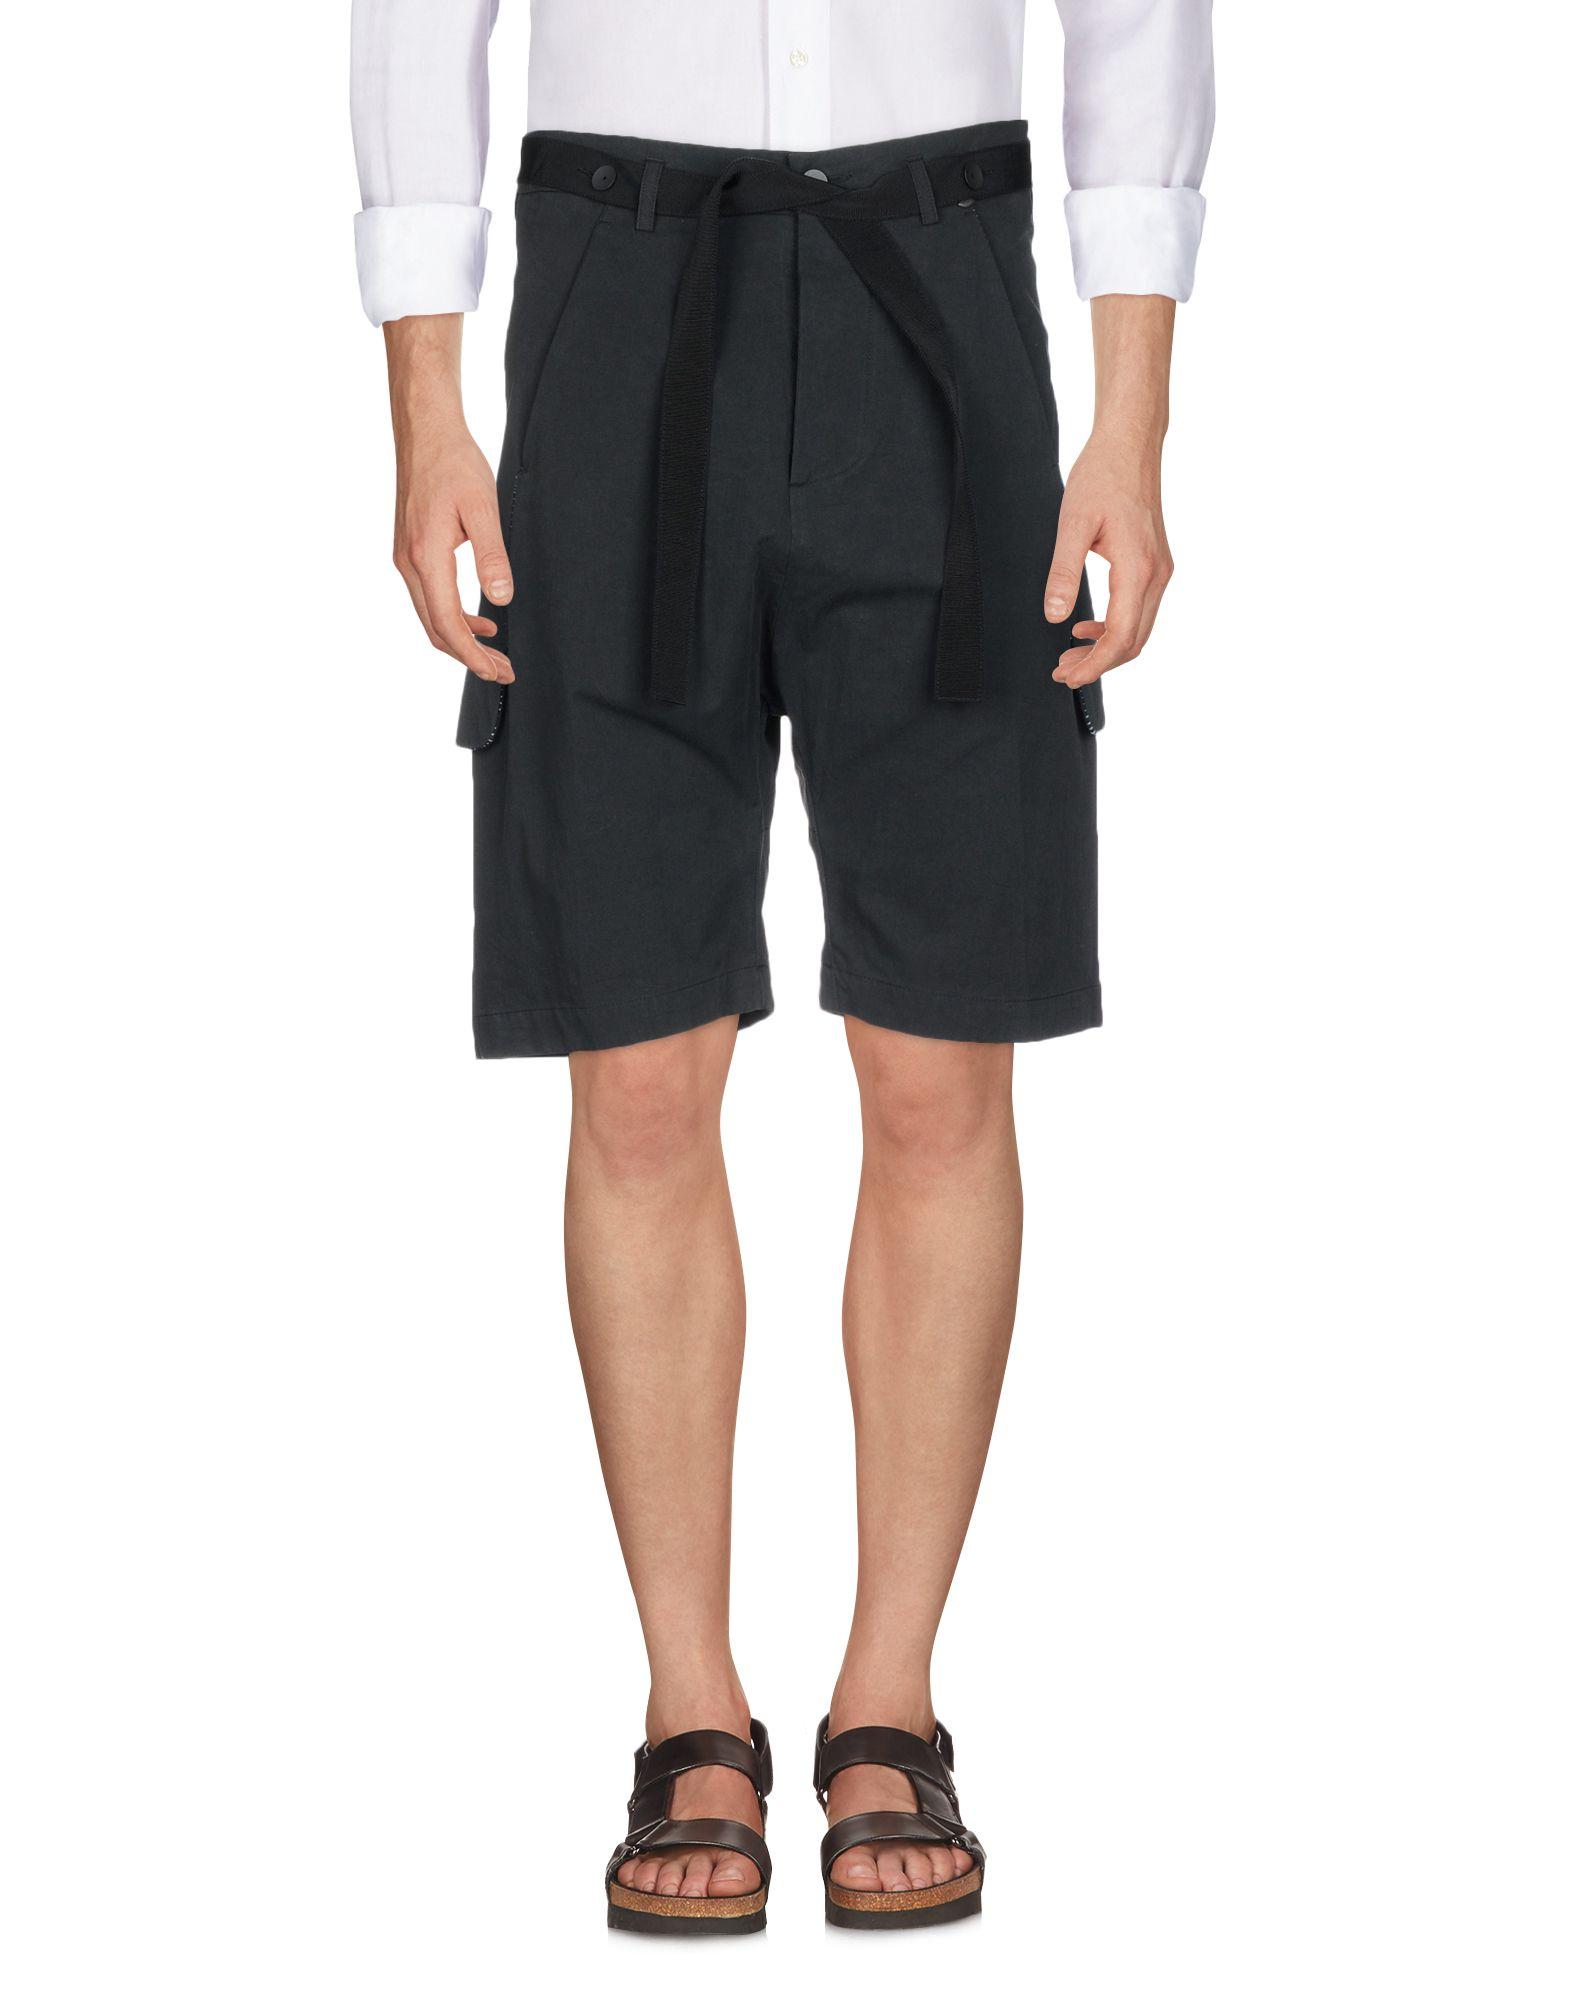 Shorts Tom Rebl Uomo - Acquista online su